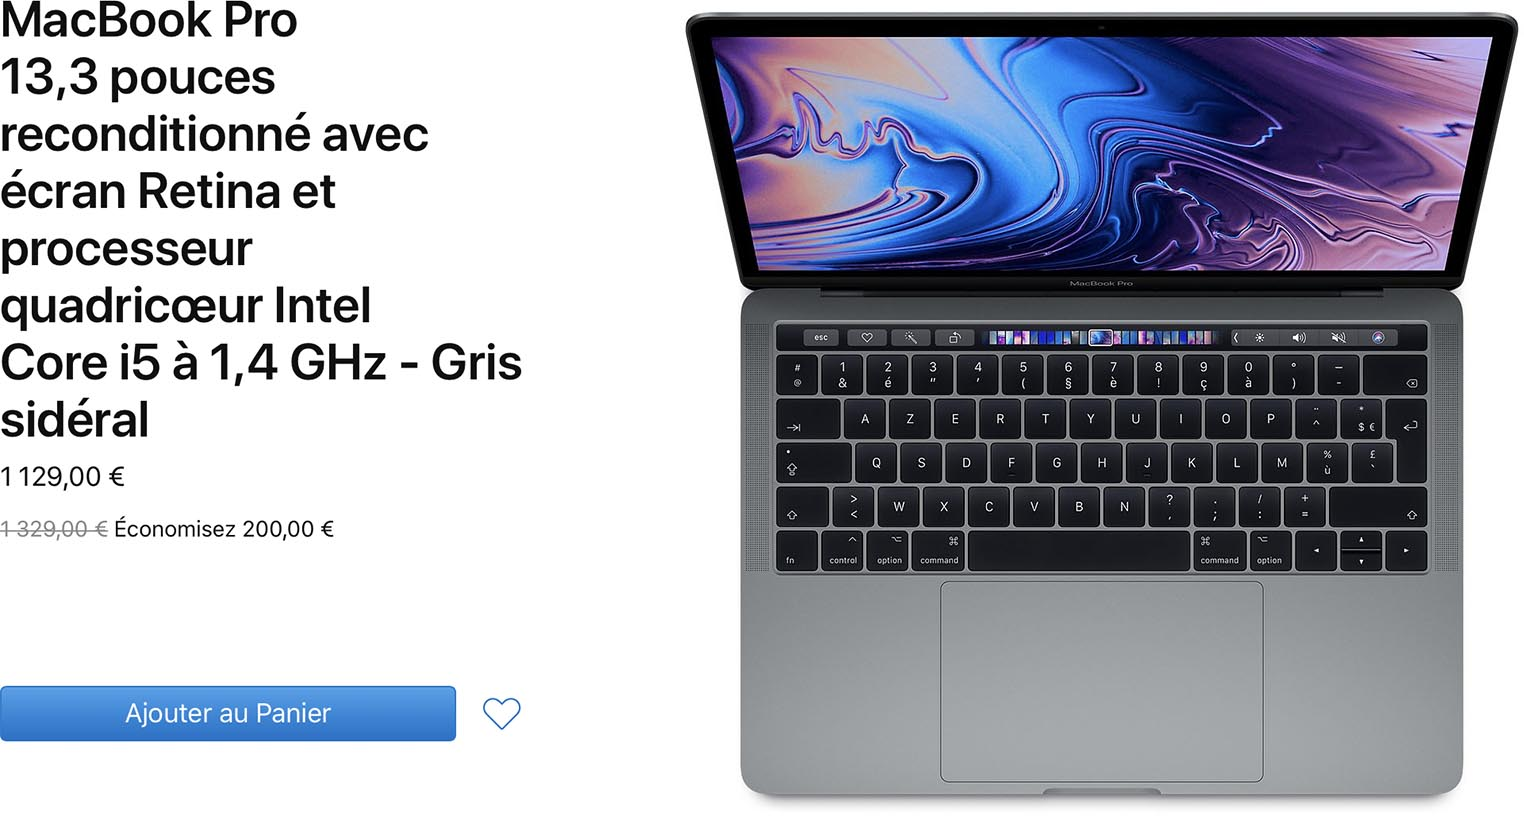 MacBook Pro 13,3 Refurb